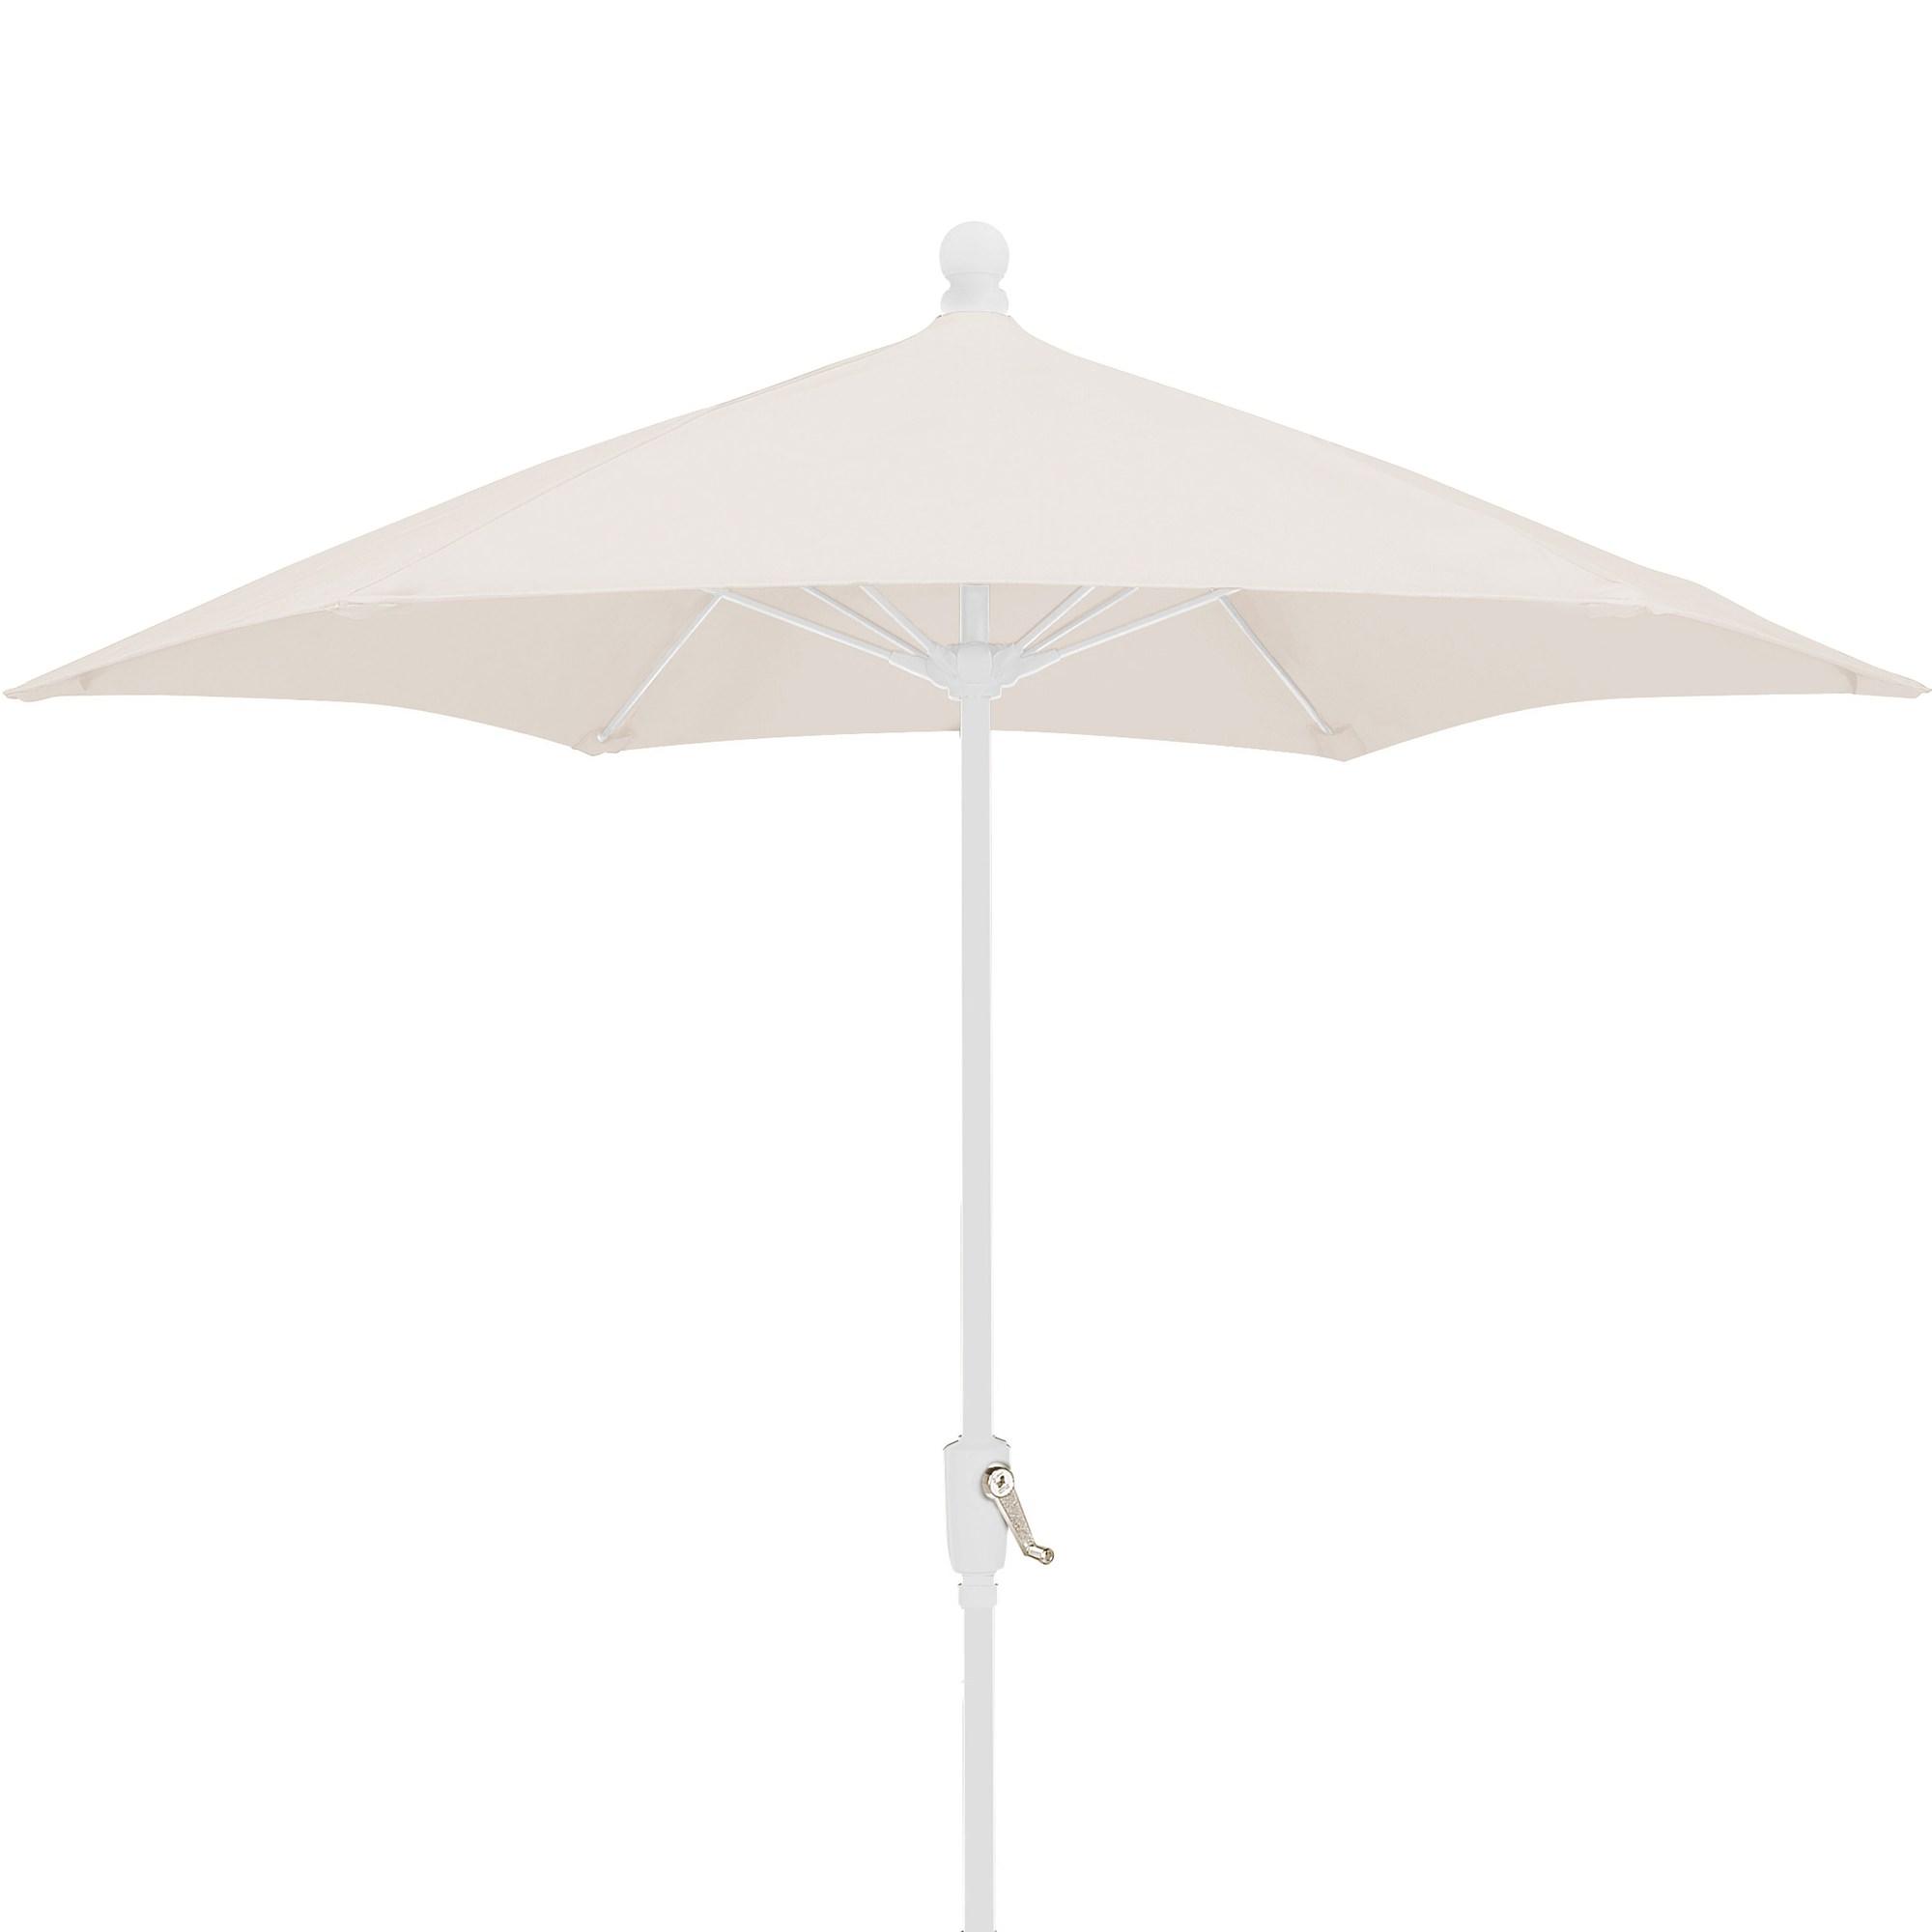 Charmant 7.5 Ft Crank Lift Patio Umbrella With White Pole